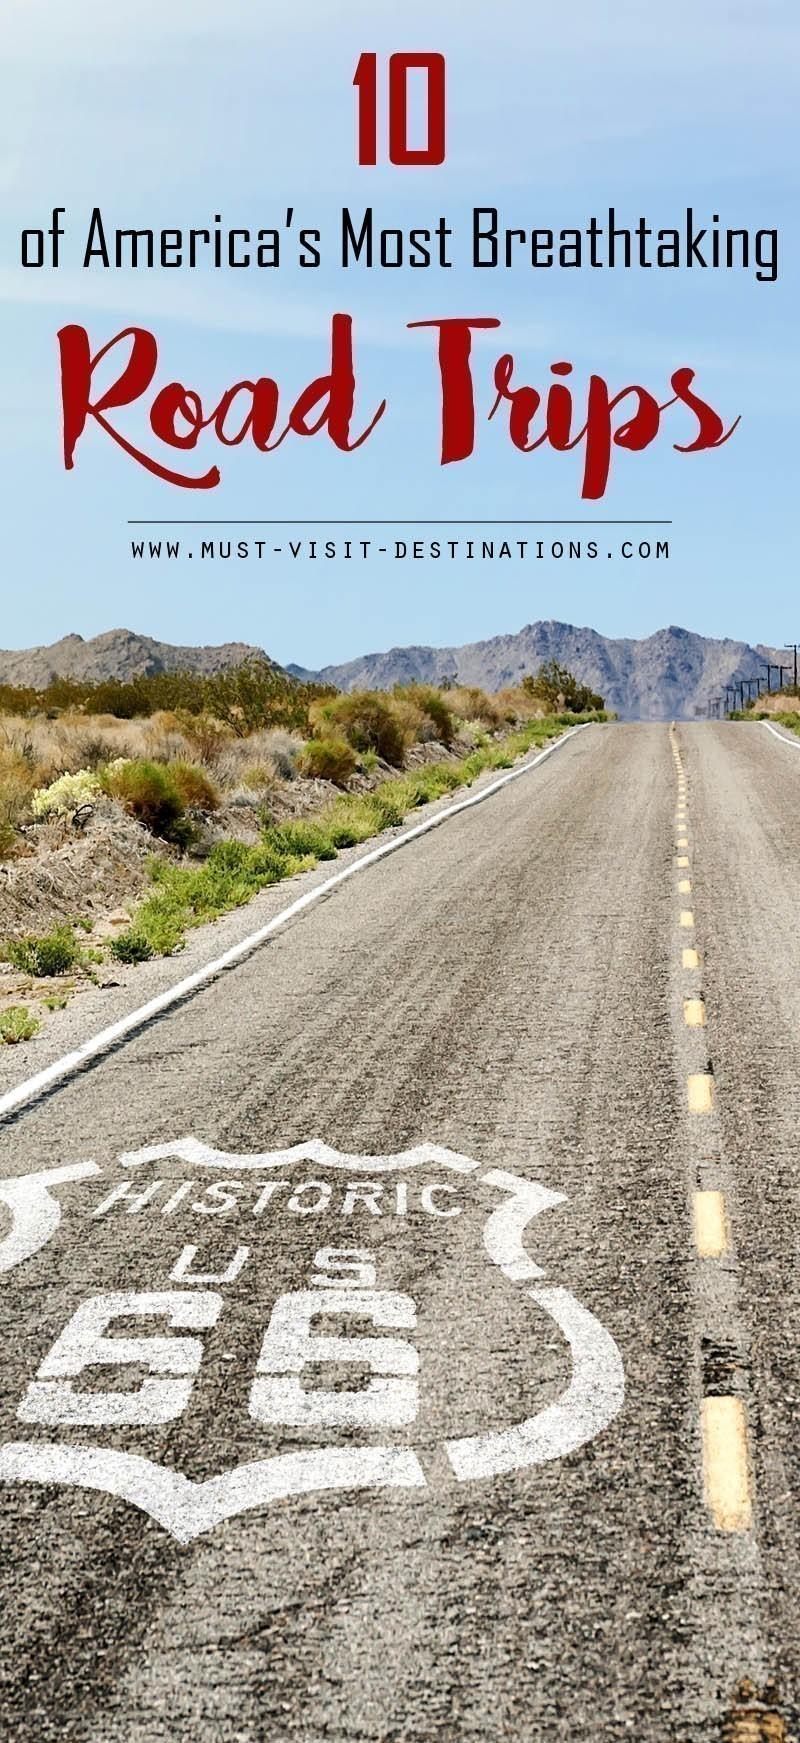 10 Of America's Most Breathtaking Road Trips #travel #RoadTrip